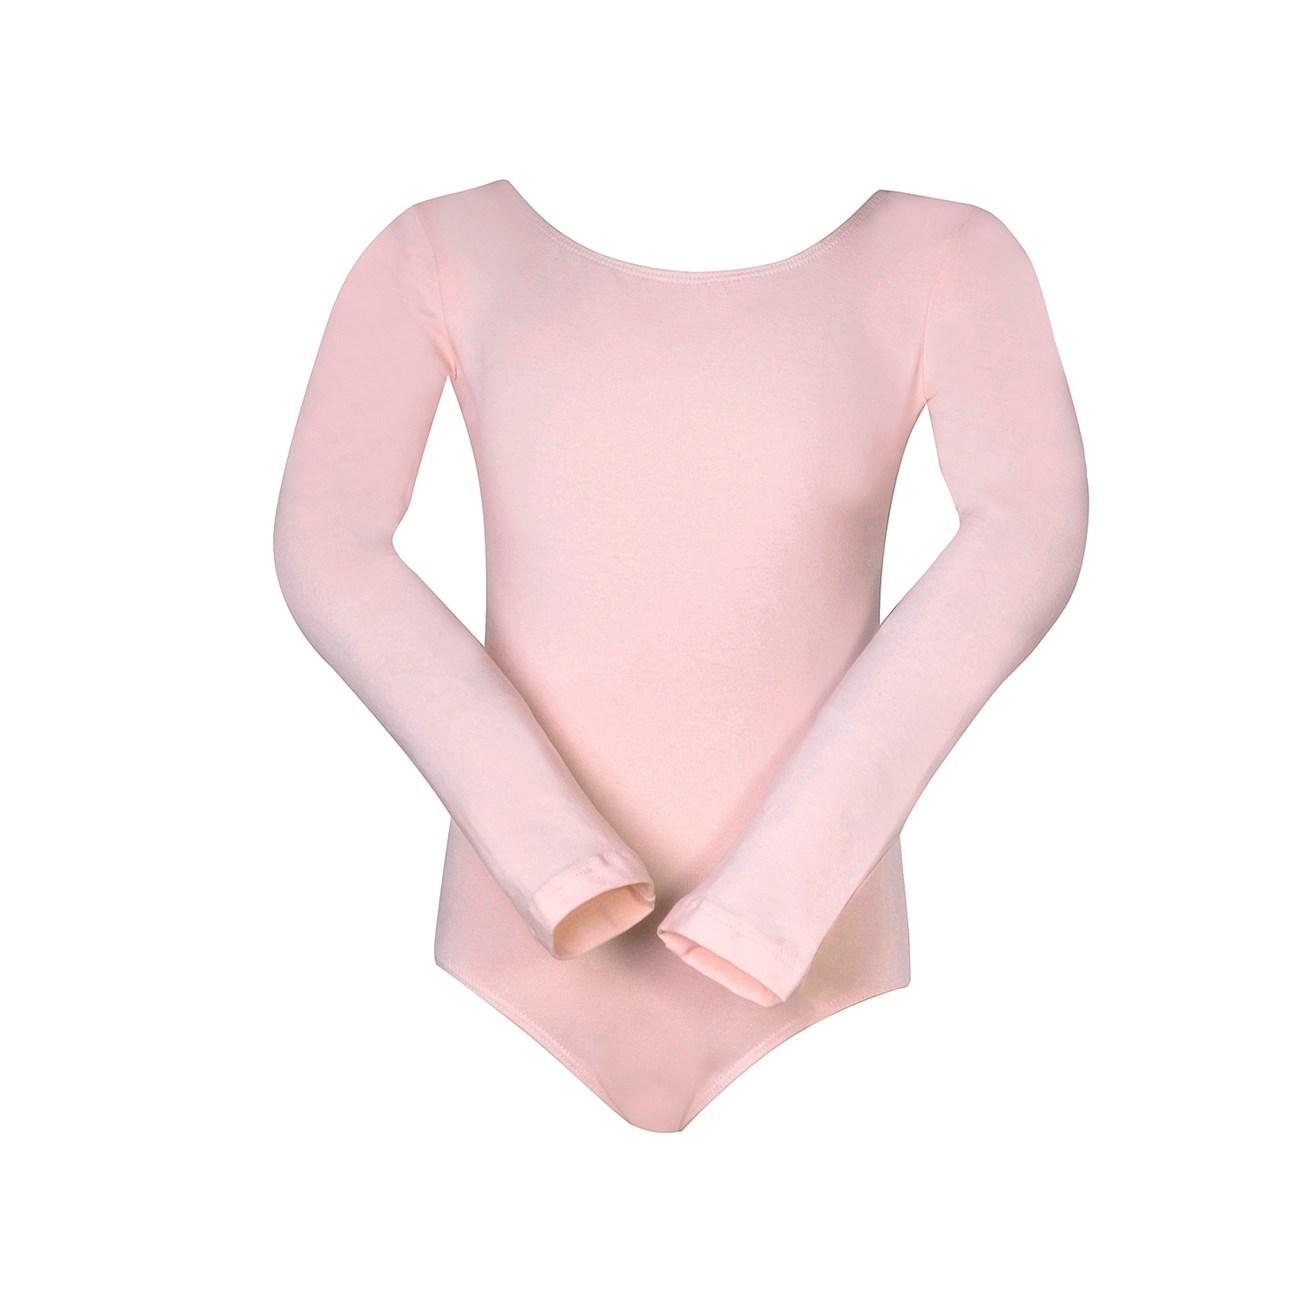 aba9a4b51f9 GO DANCE Bodies LONG SLEEVE LEOTARD < Ρούχα Μπαλέτου | INTERSPORT